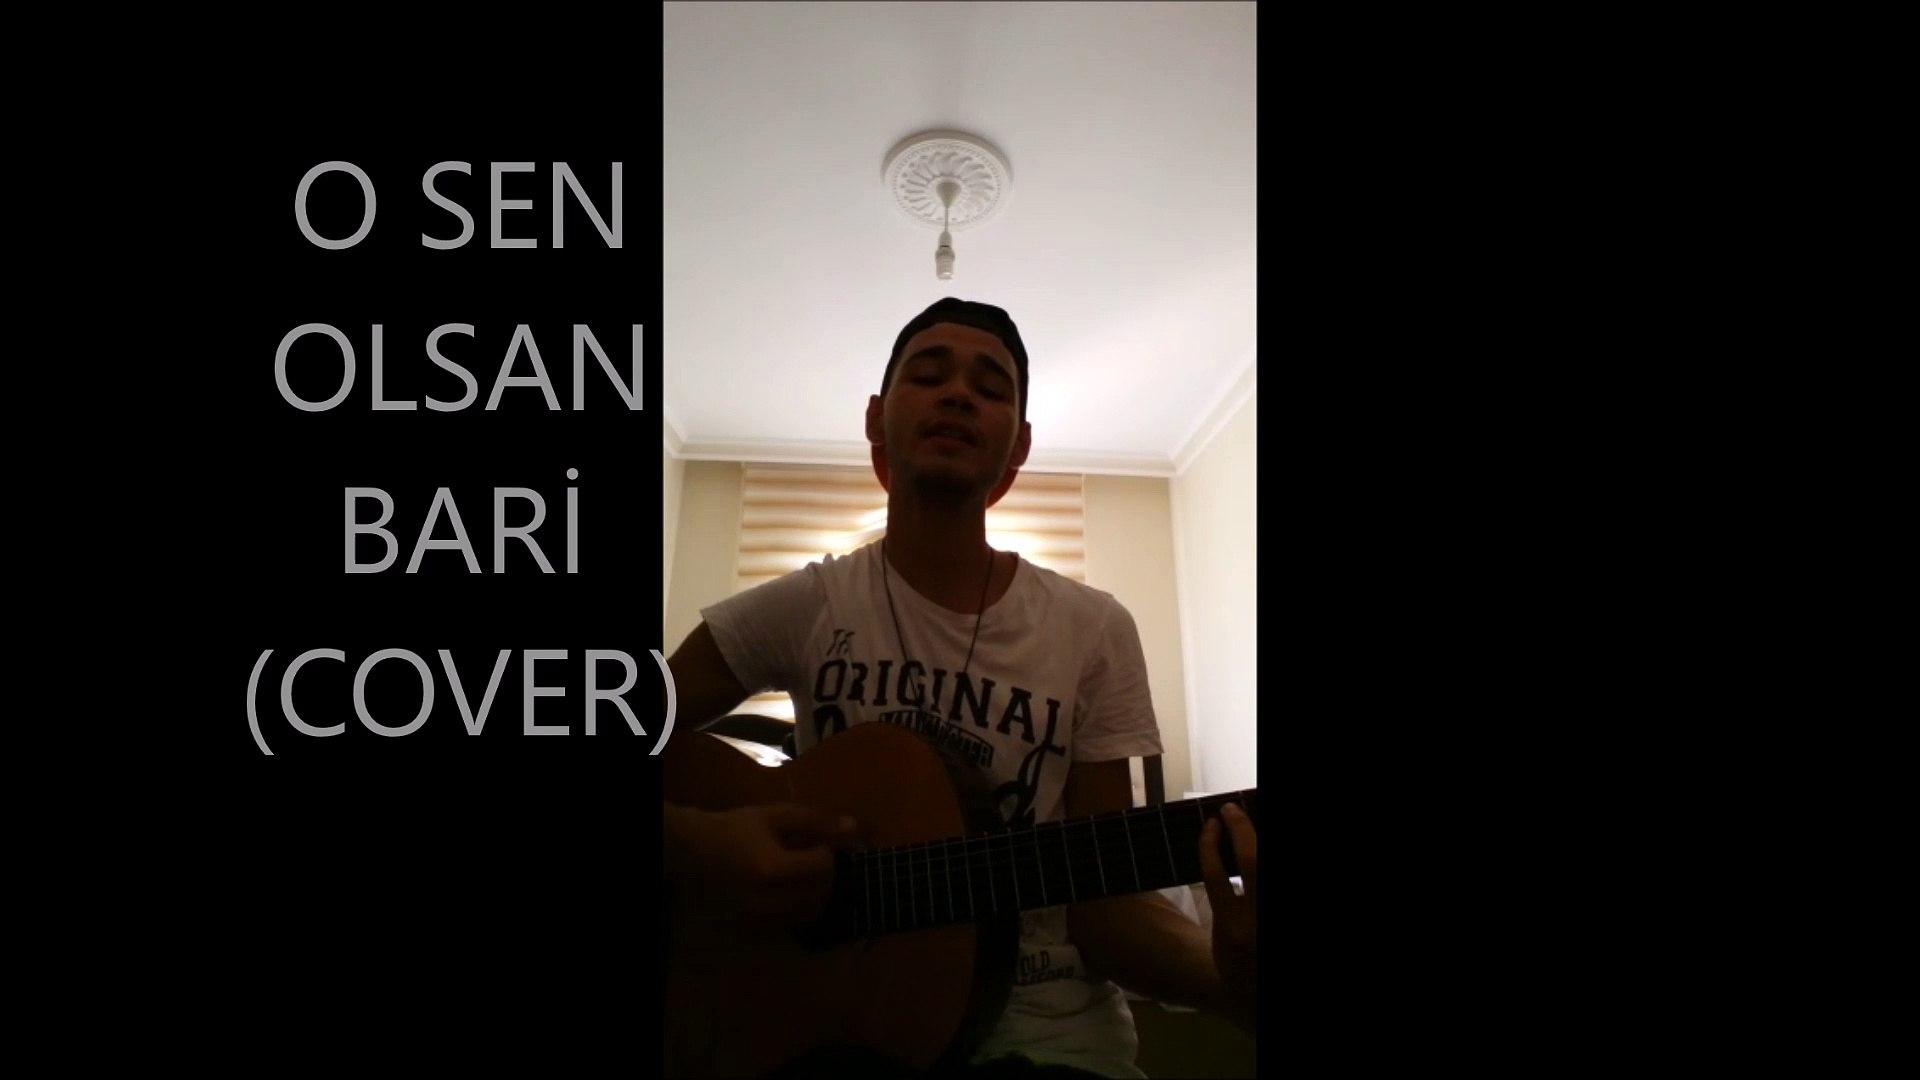 Aleyna Tilki - O SEN OLSAN BARİ (Gitar Cover)